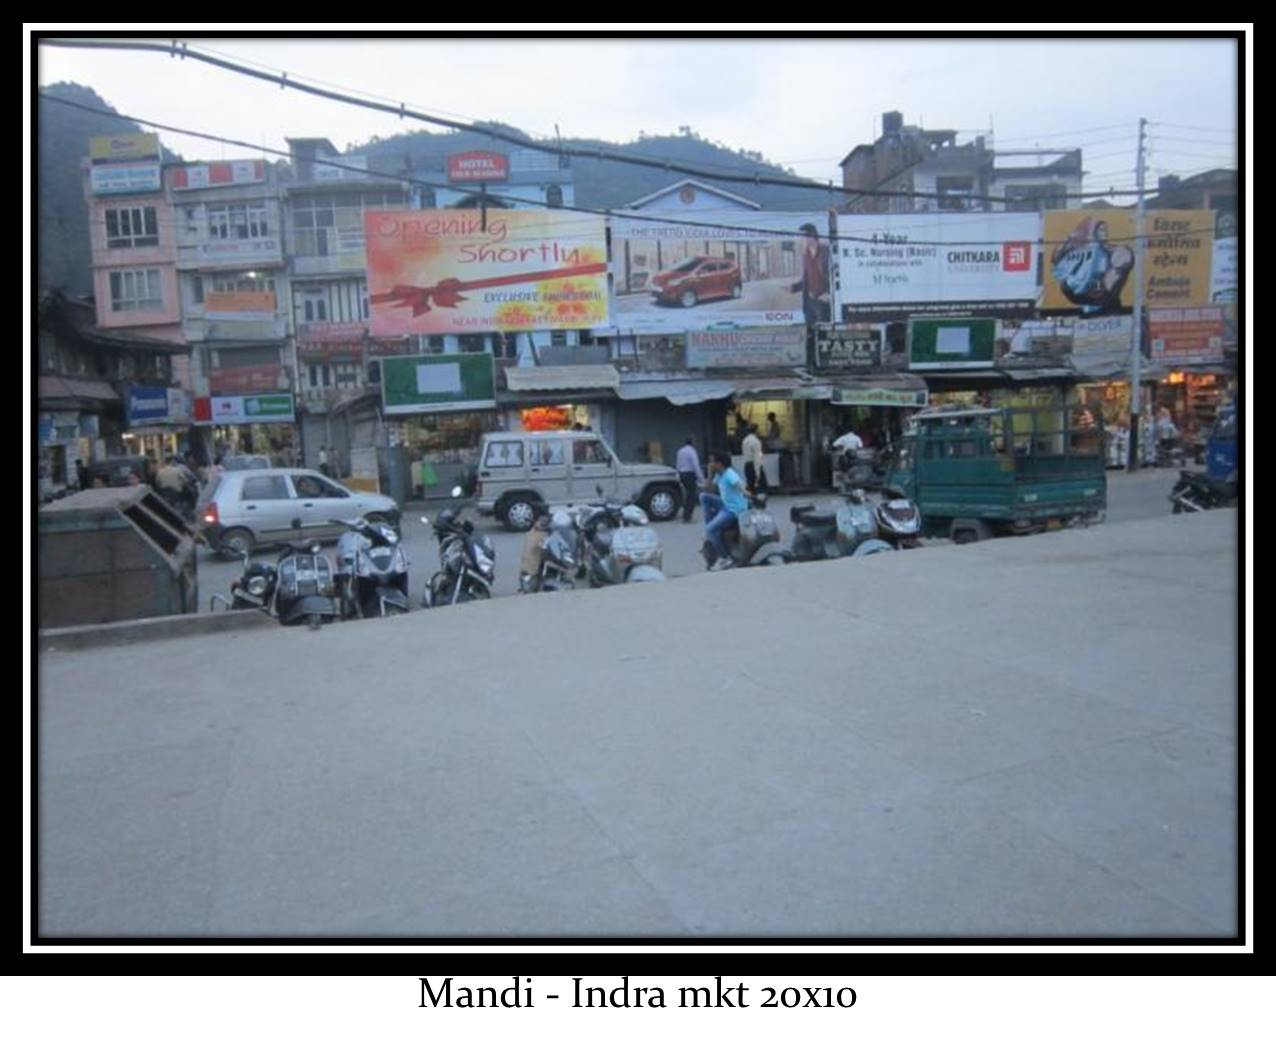 Indera market, Mandi